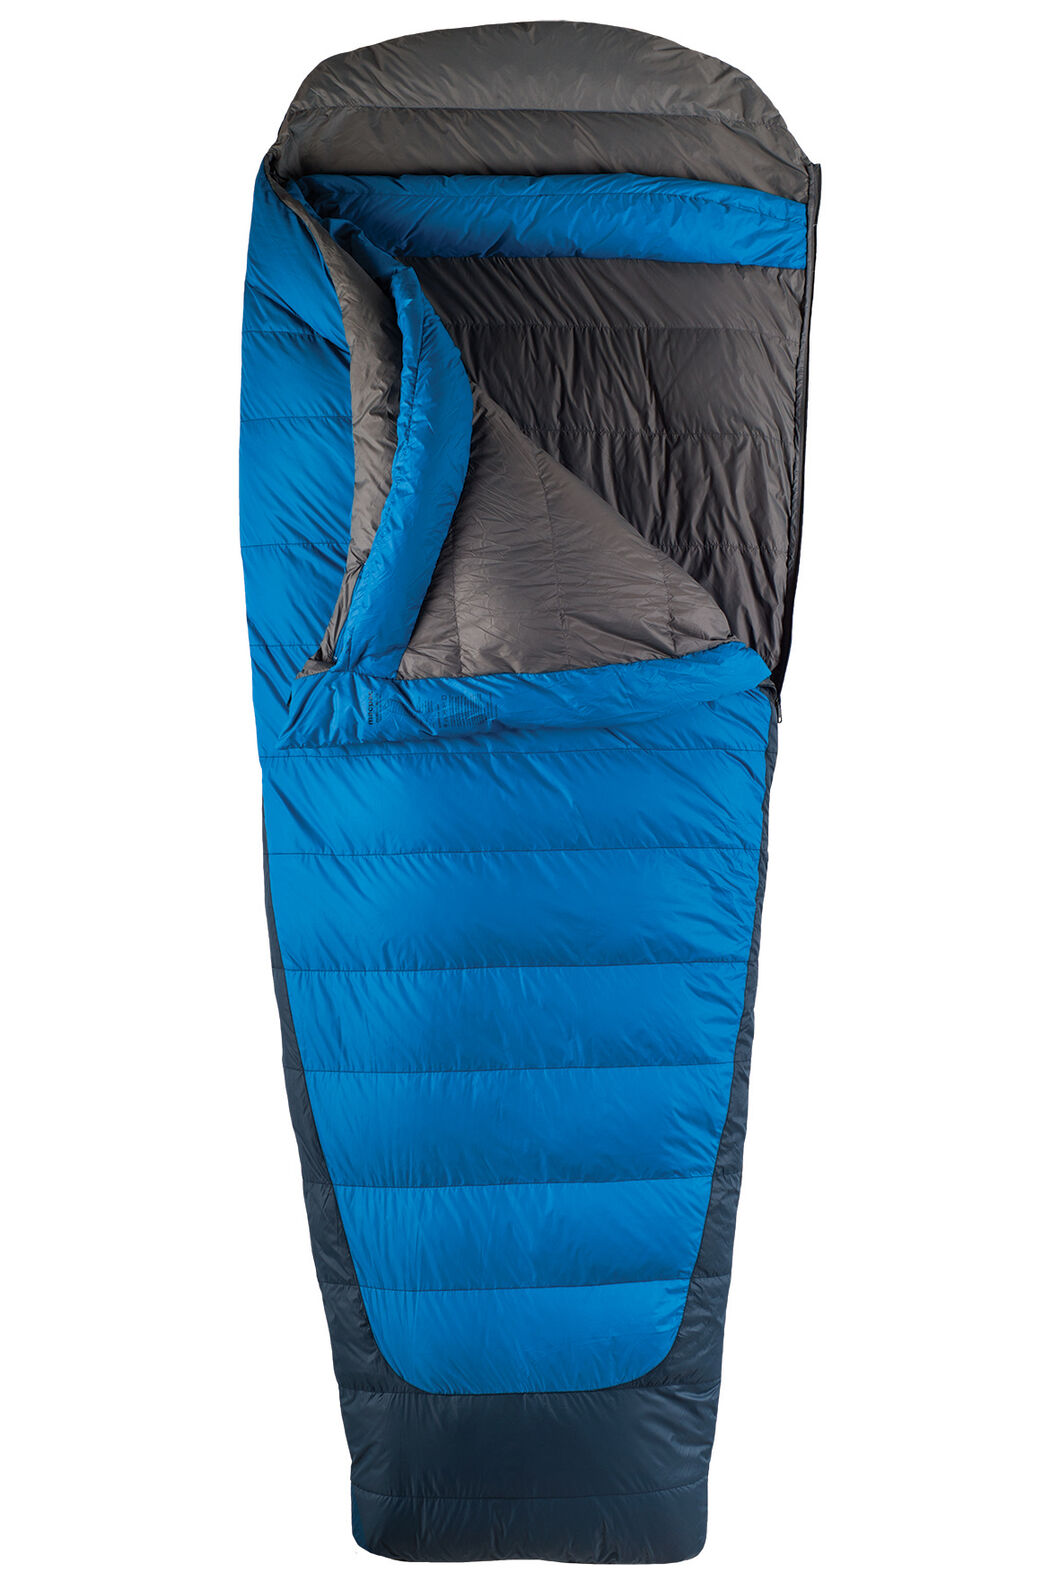 Macpac Escapade 700 Extra Large Down Sleeping Bag, Classic Blue, hi-res